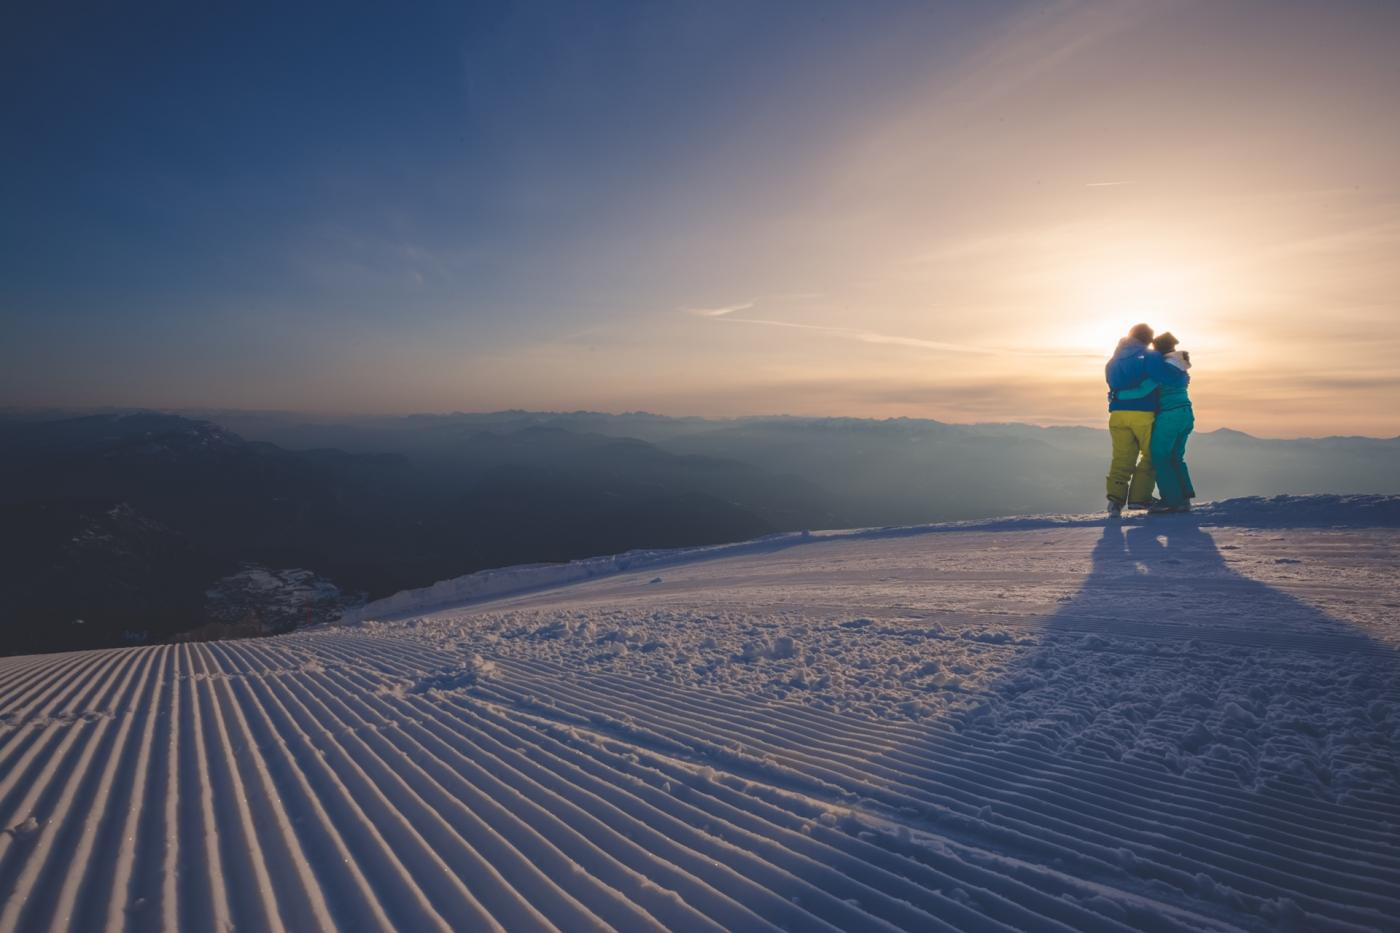 48 hours in Dolomiti Paganella: idea for a Romantic getaway